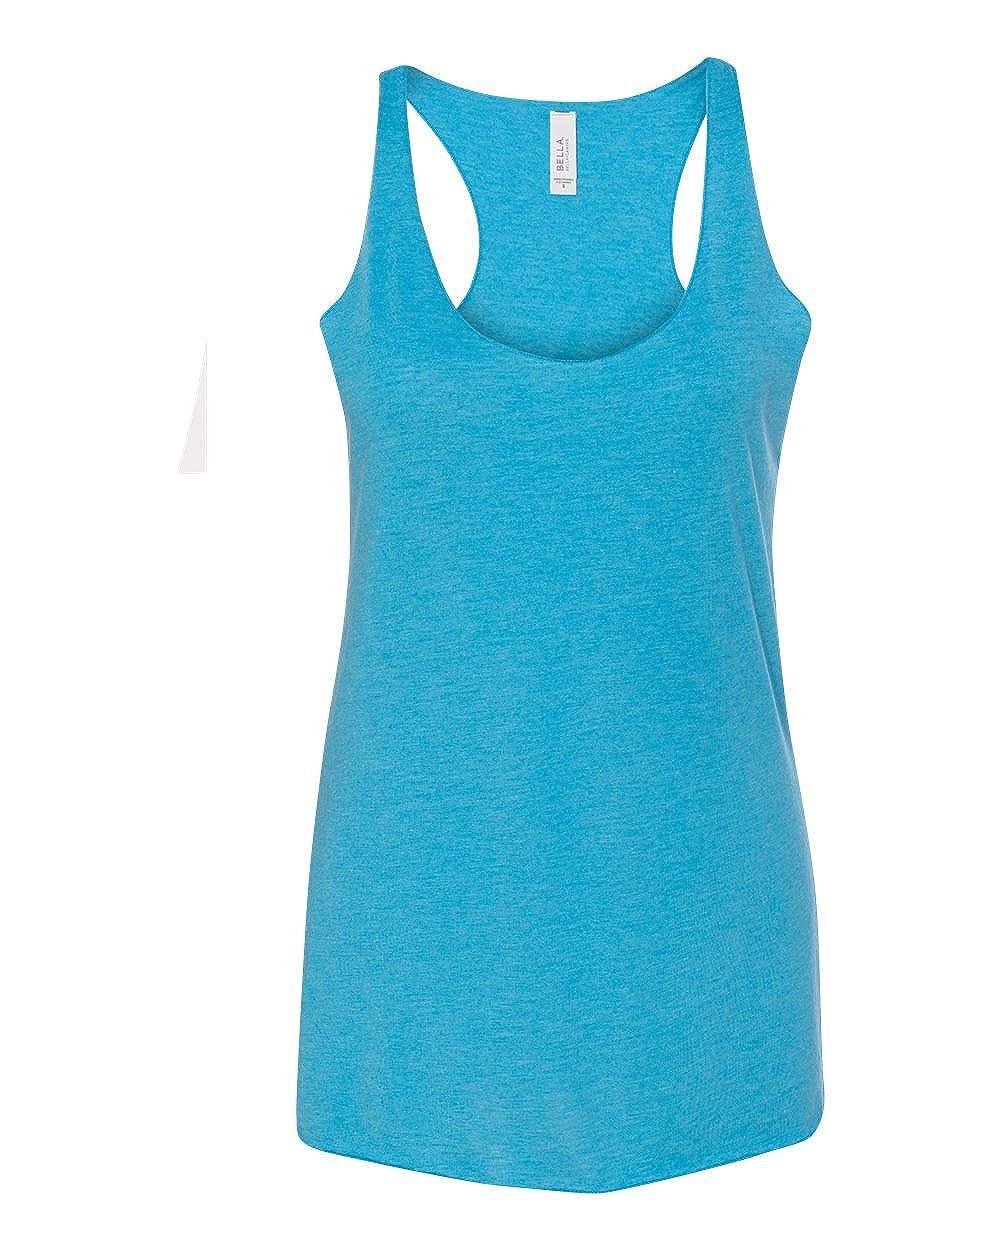 e50f7a7ba66 Bella + Canvas 8430 Ladies Sylvia Tri-Blend Racerback Tank at Amazon  Women s Clothing store